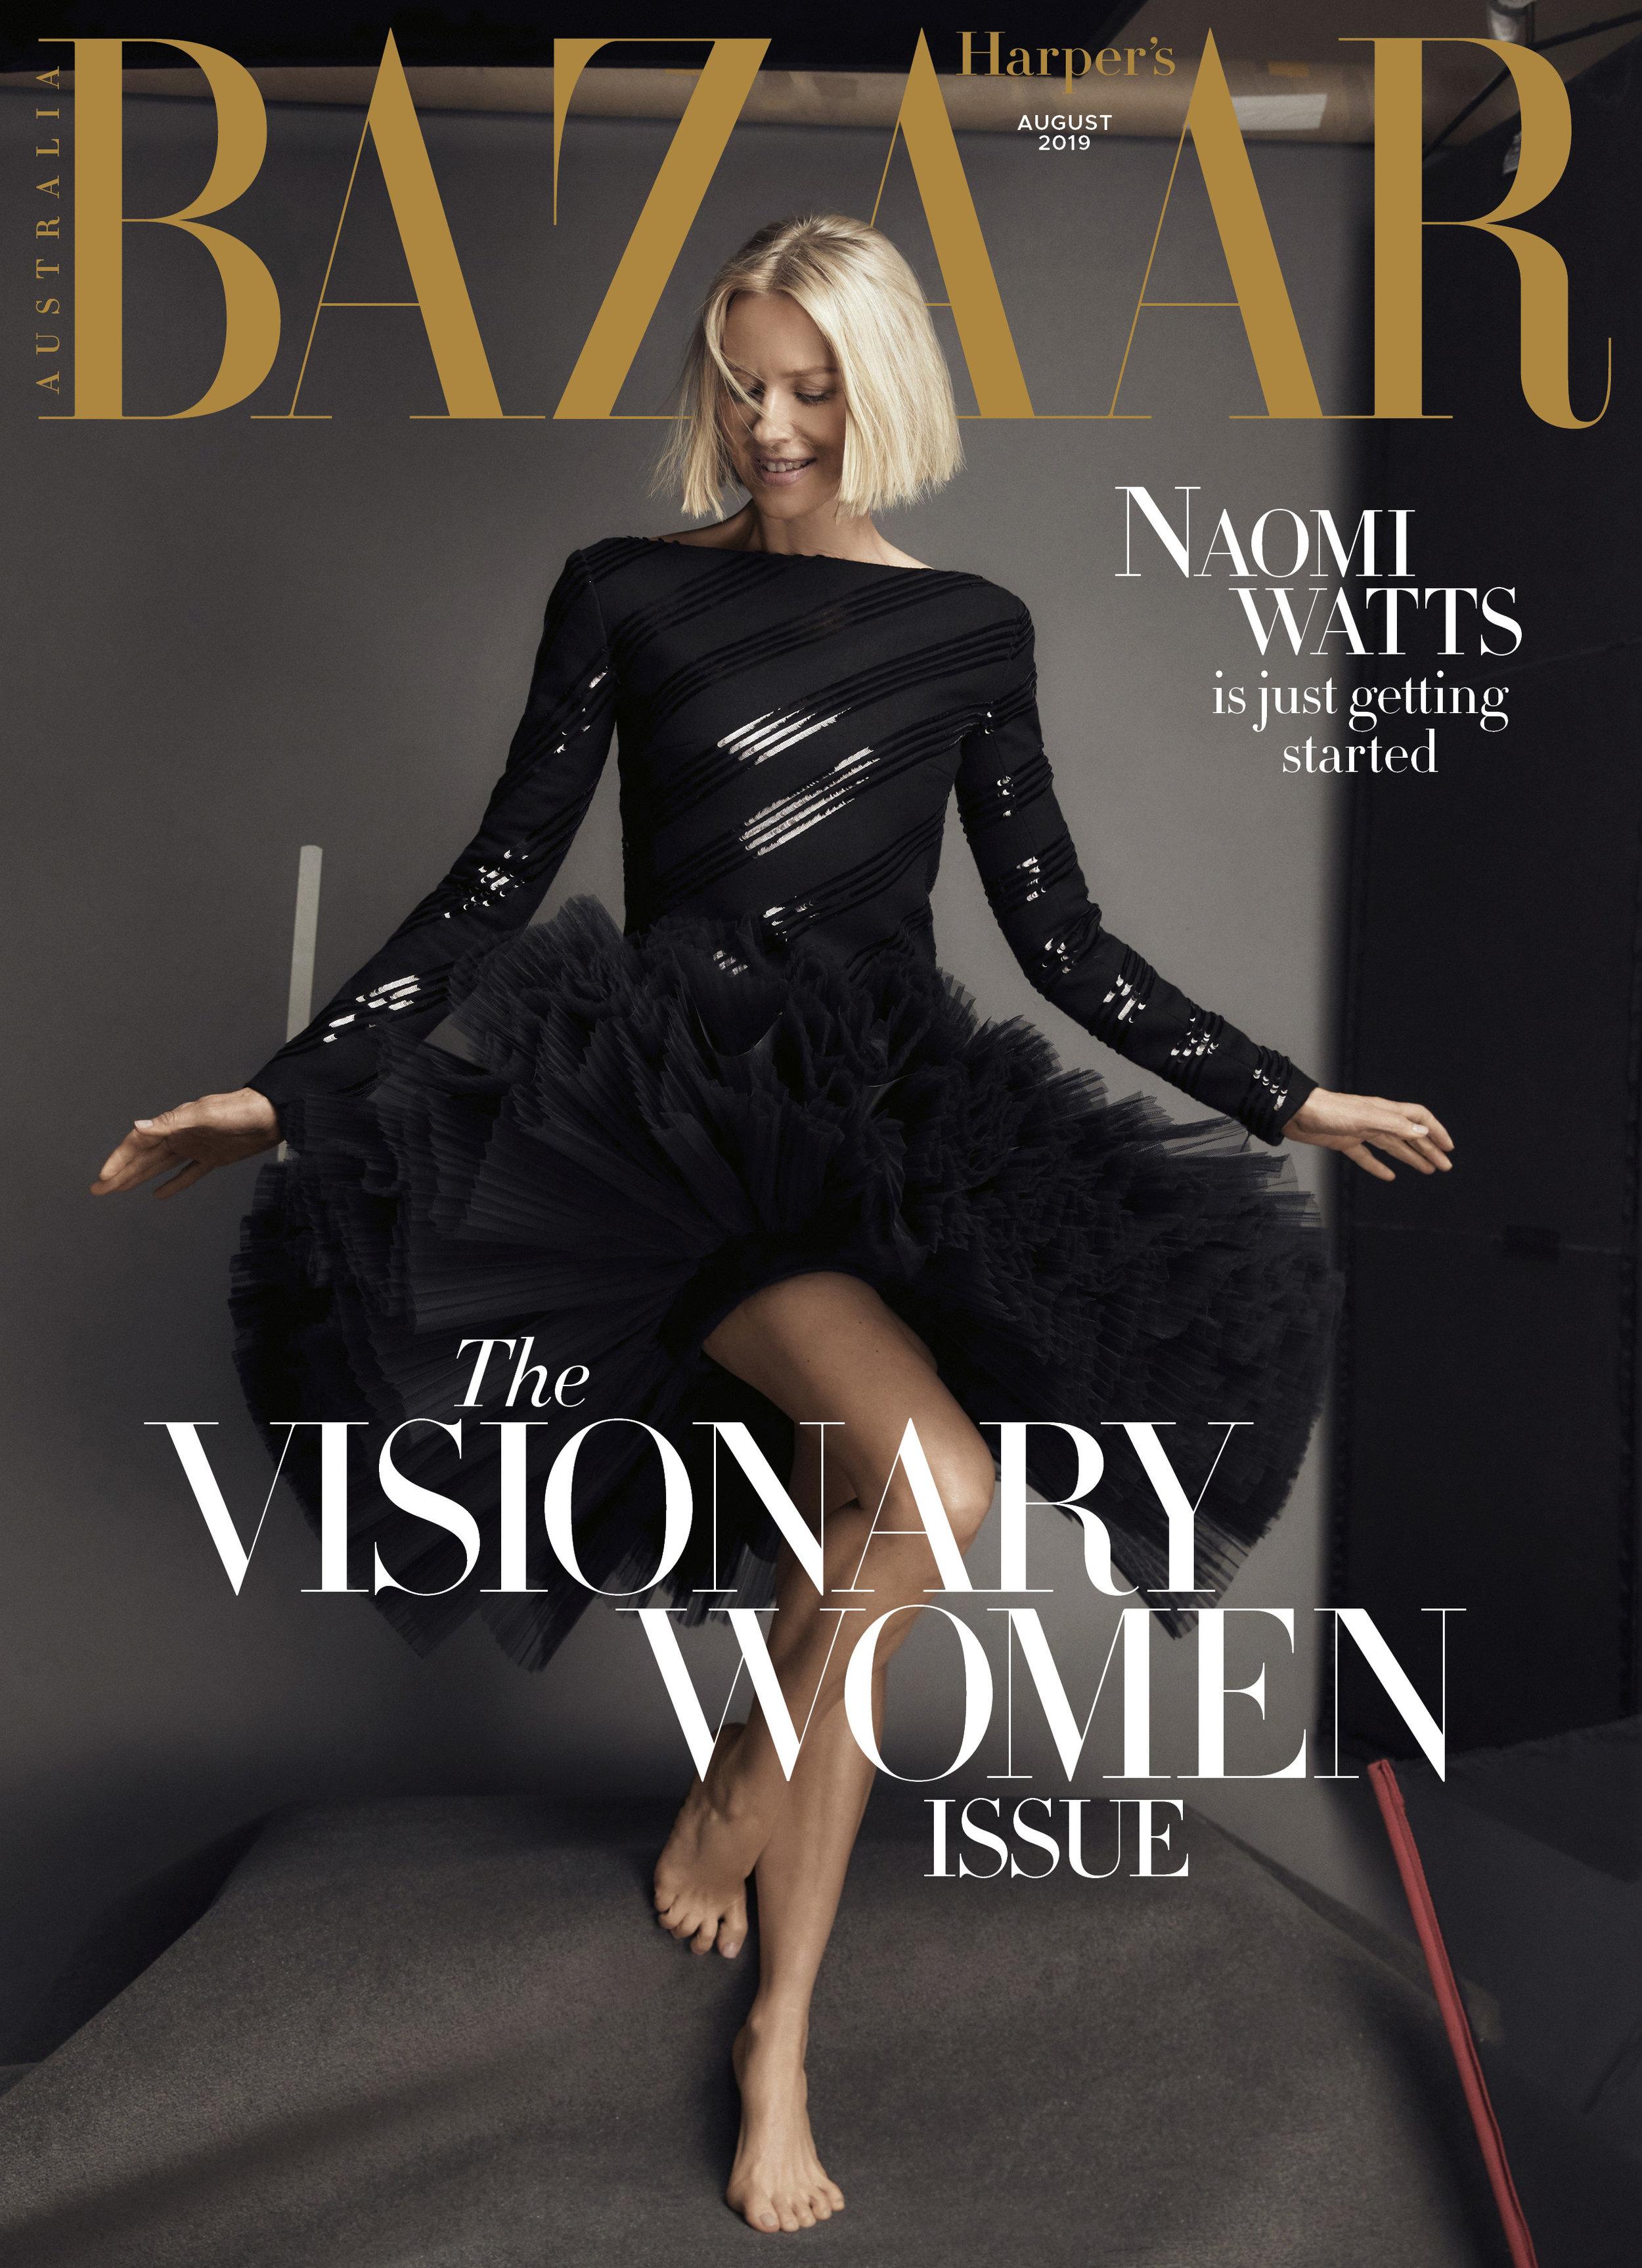 Prop Stylist | Australia Harper's Bazaar featuring Naomi Watts